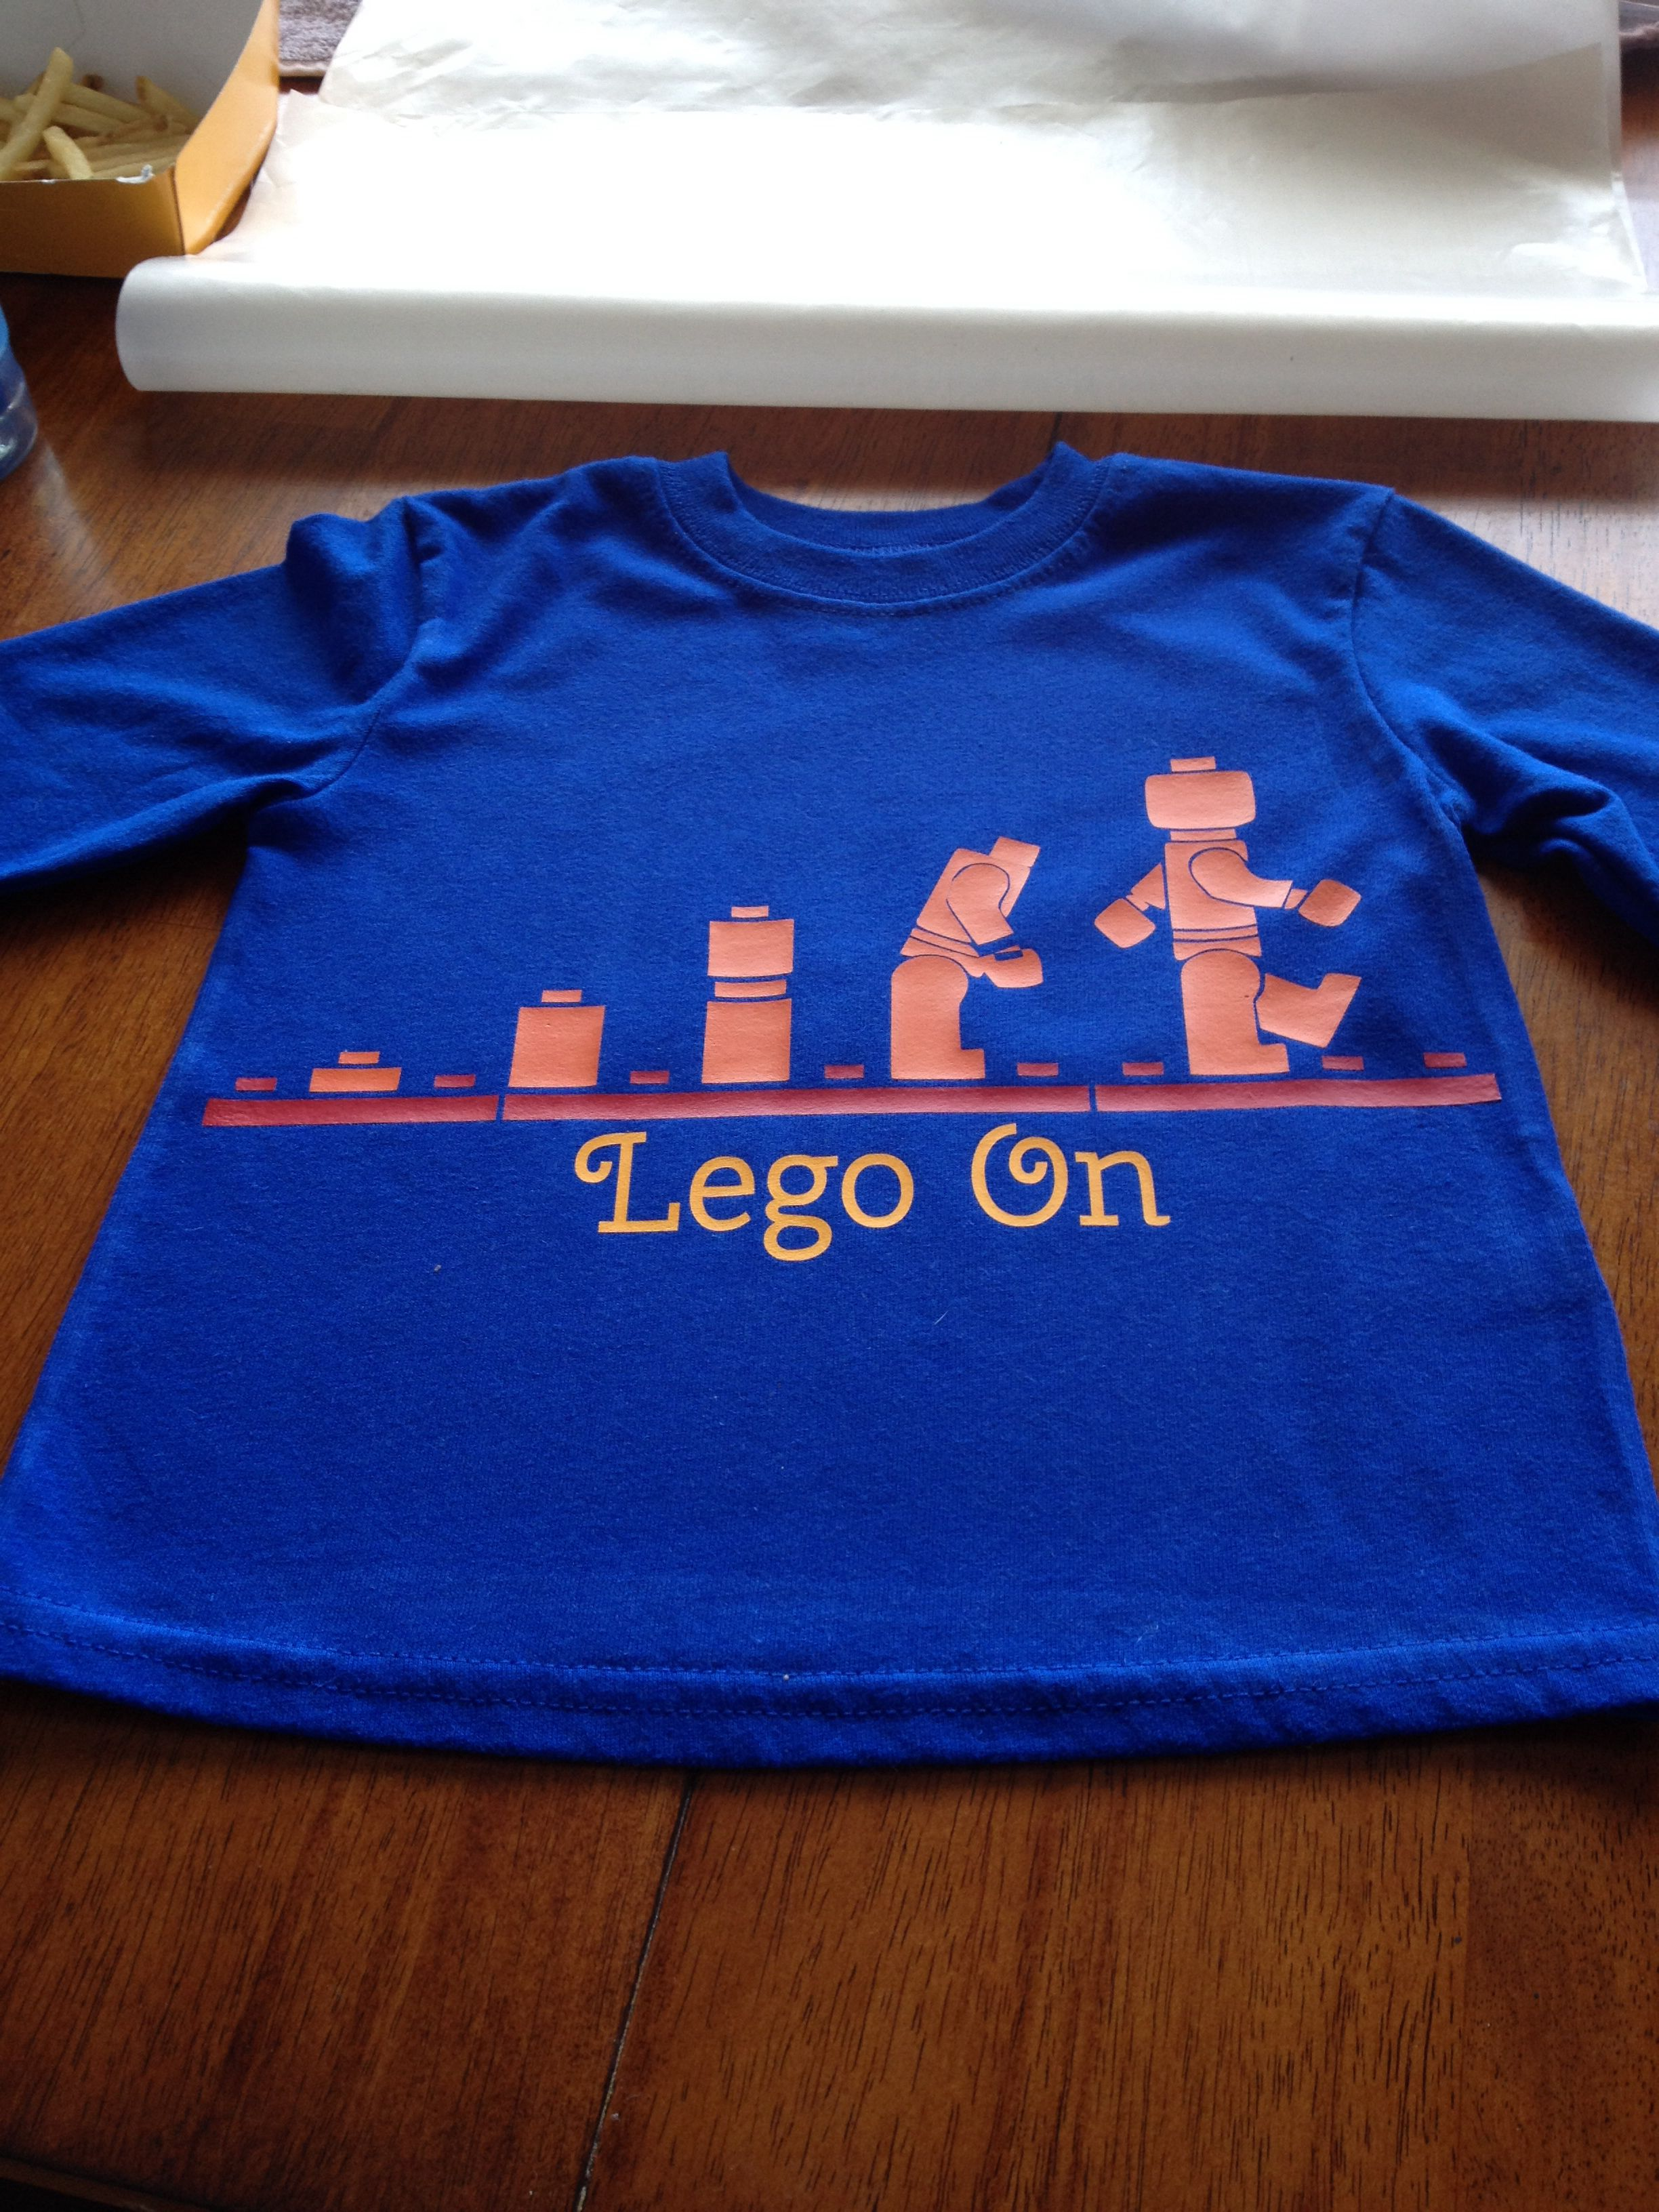 Heat Transfer Vinyl Lego Evolution Shirt Vinyl Shirt Ideas